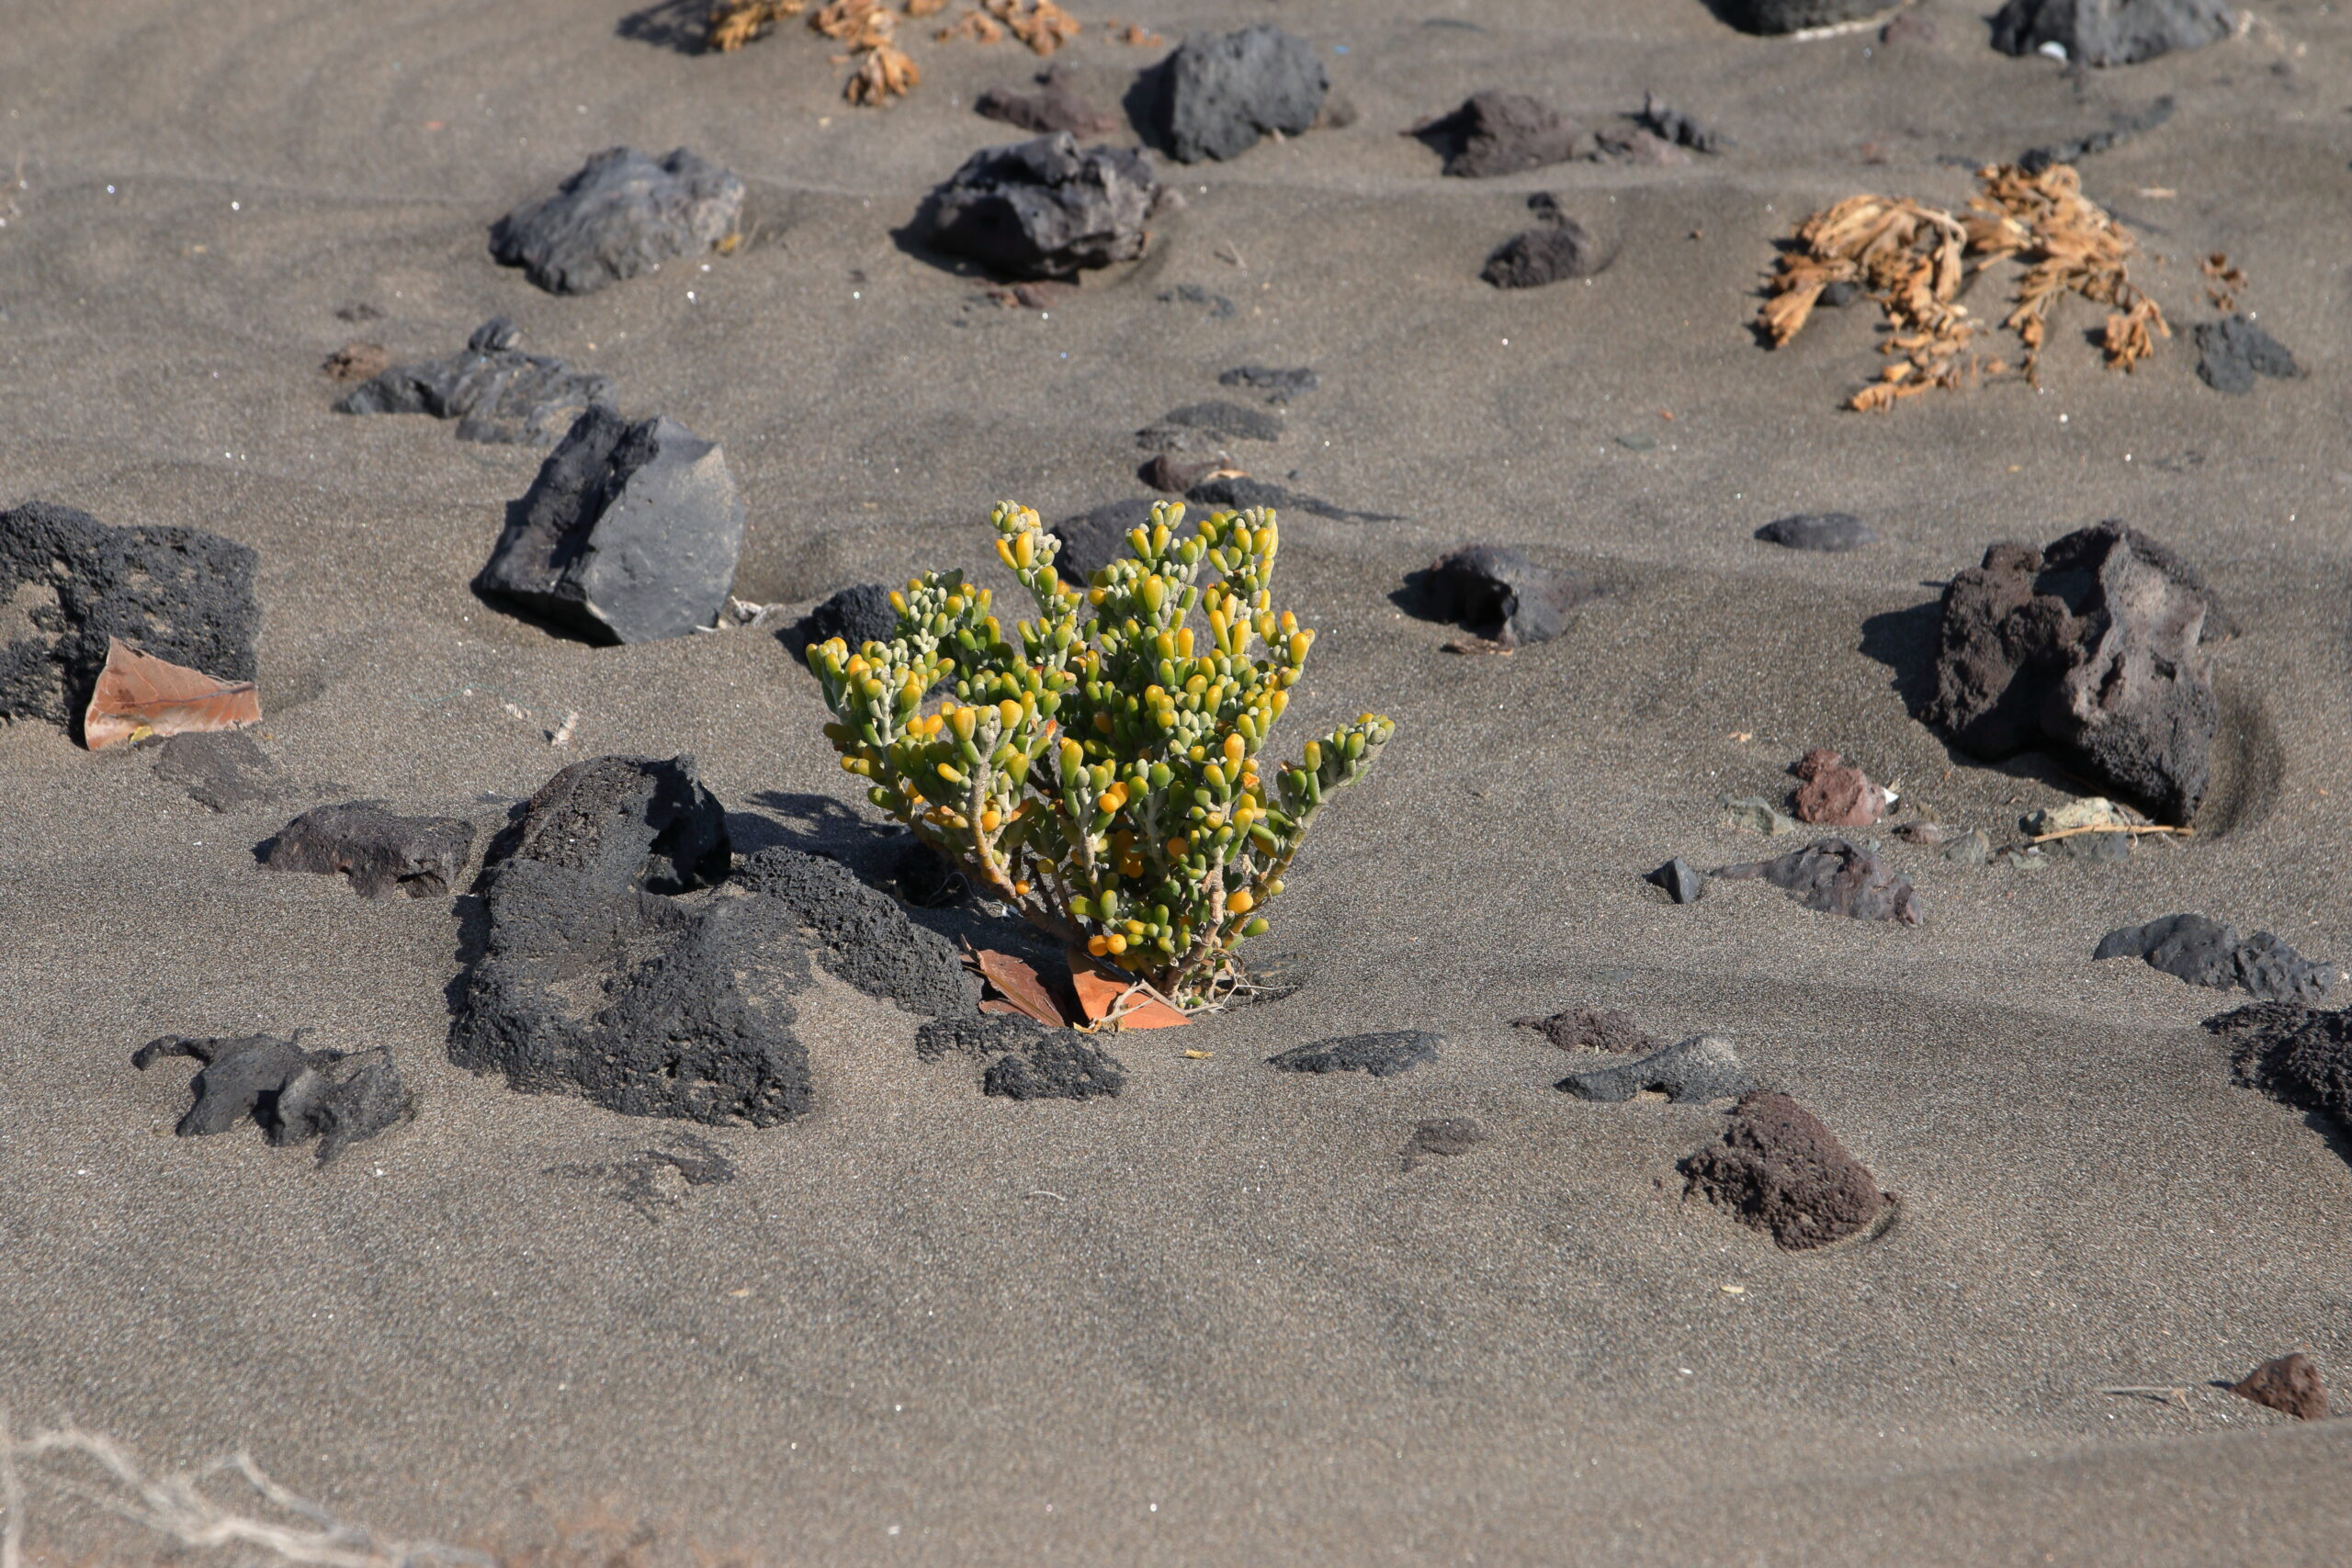 img_7045-habitat-uva-de-mar-comun-salado-moro-babosa-tetraena-fontanesii-2-scaled.jpg